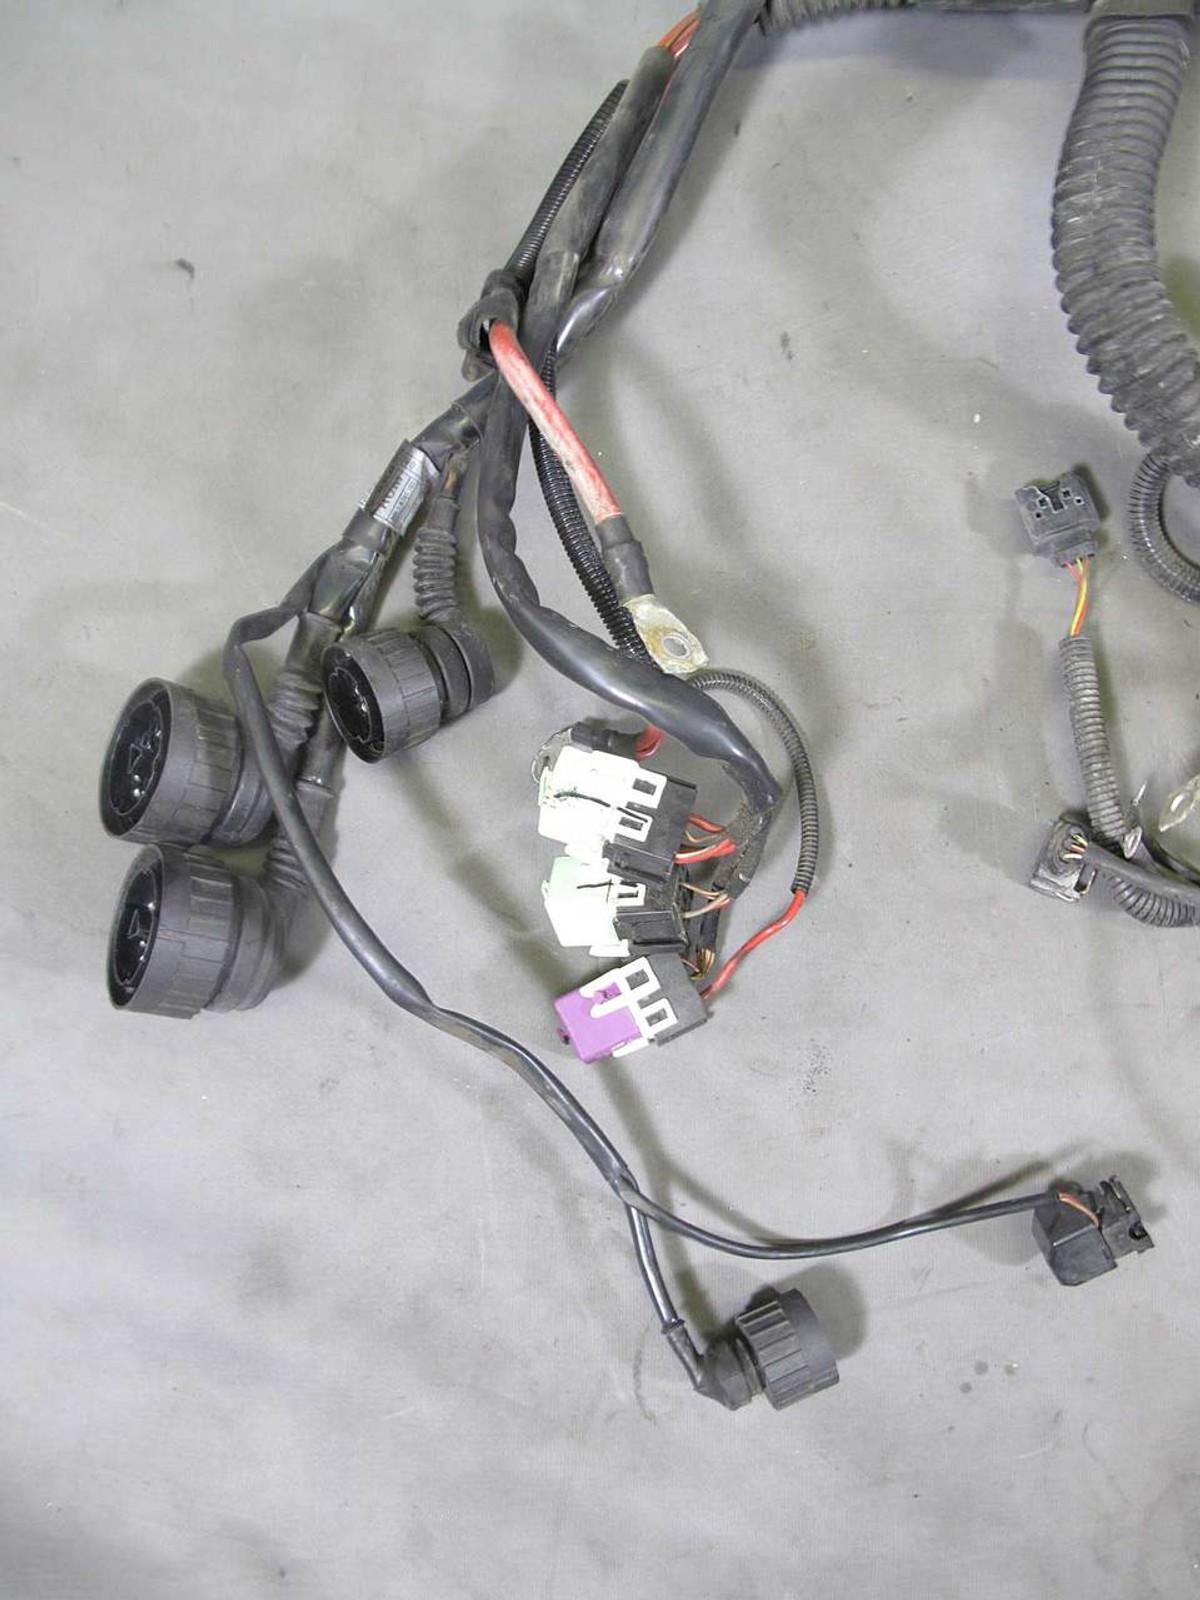 hight resolution of toyota wire harness repair manual 1 wiring diagram source wire harness sxf dirt bike no keysxdirtbikewiringjpg